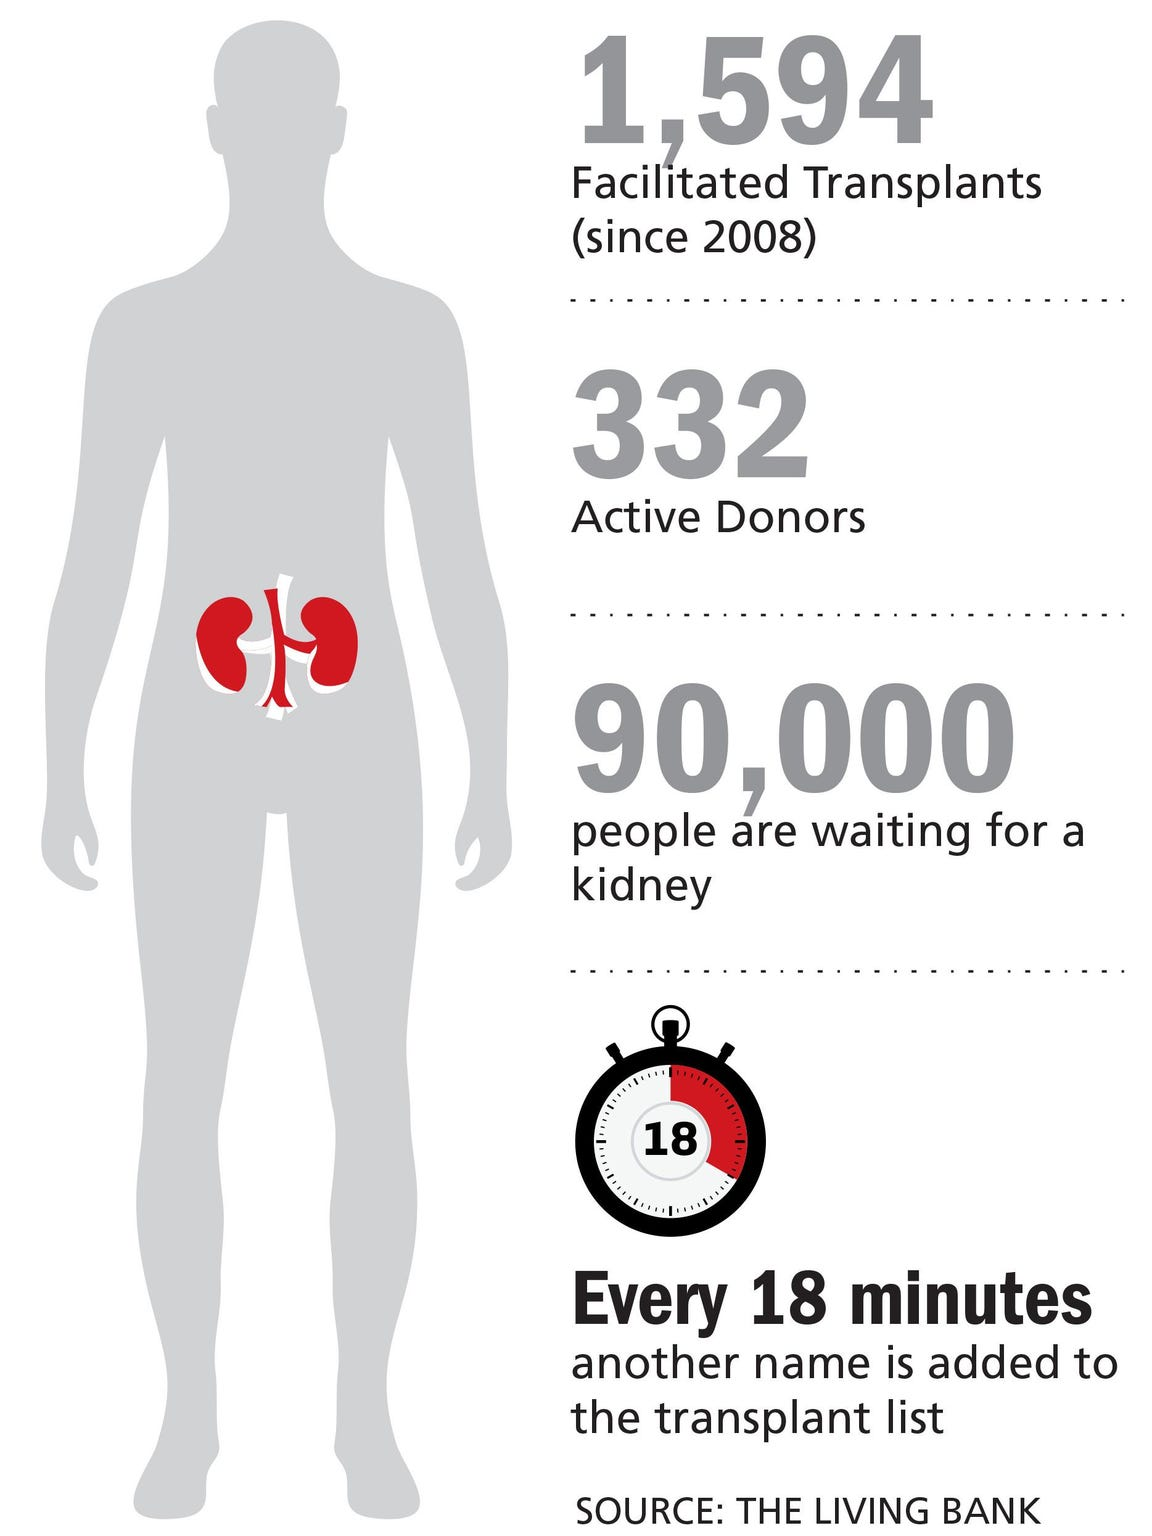 Kidney donations